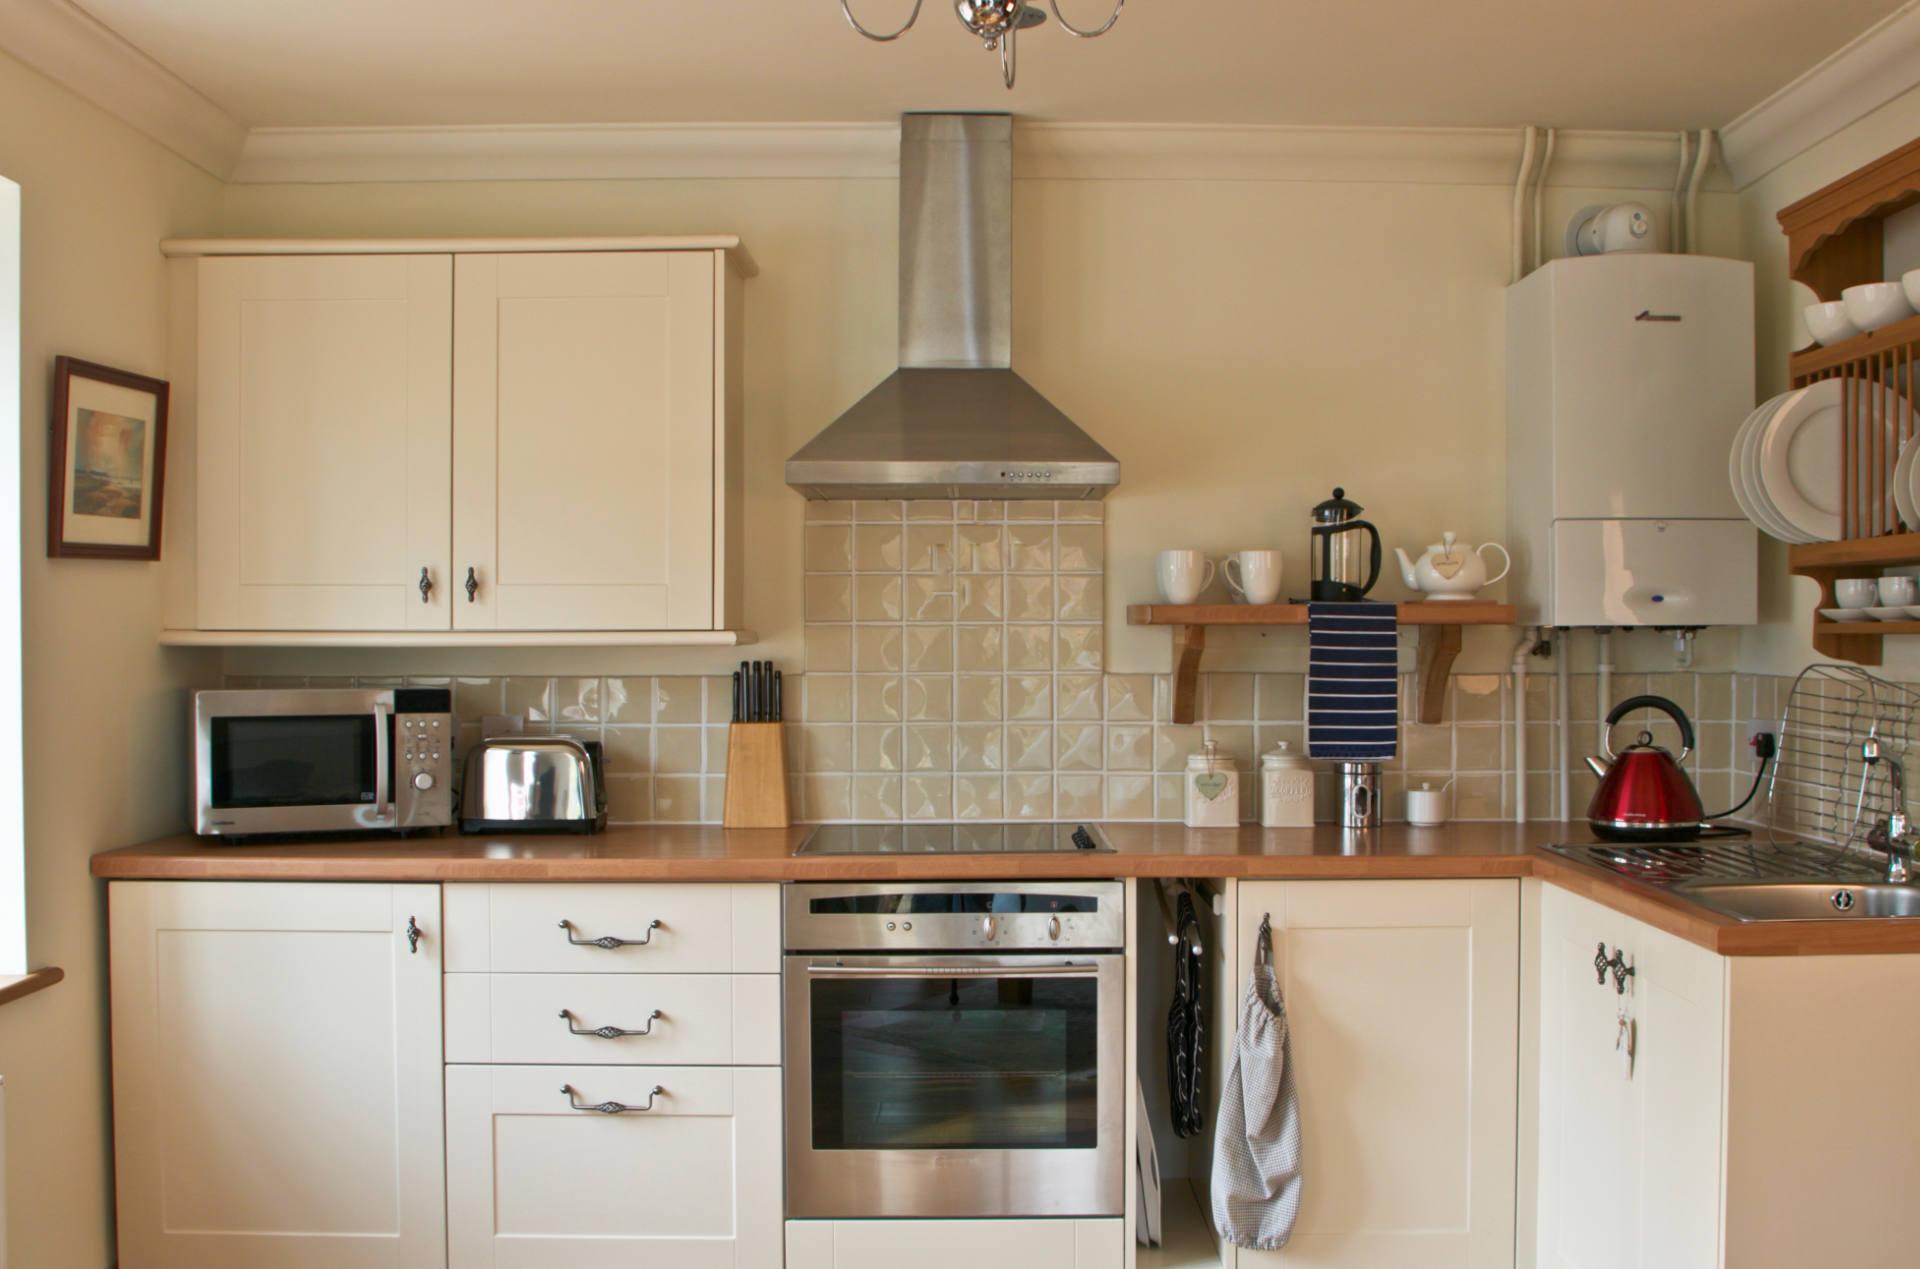 Holiday accommodation modern kitchen.